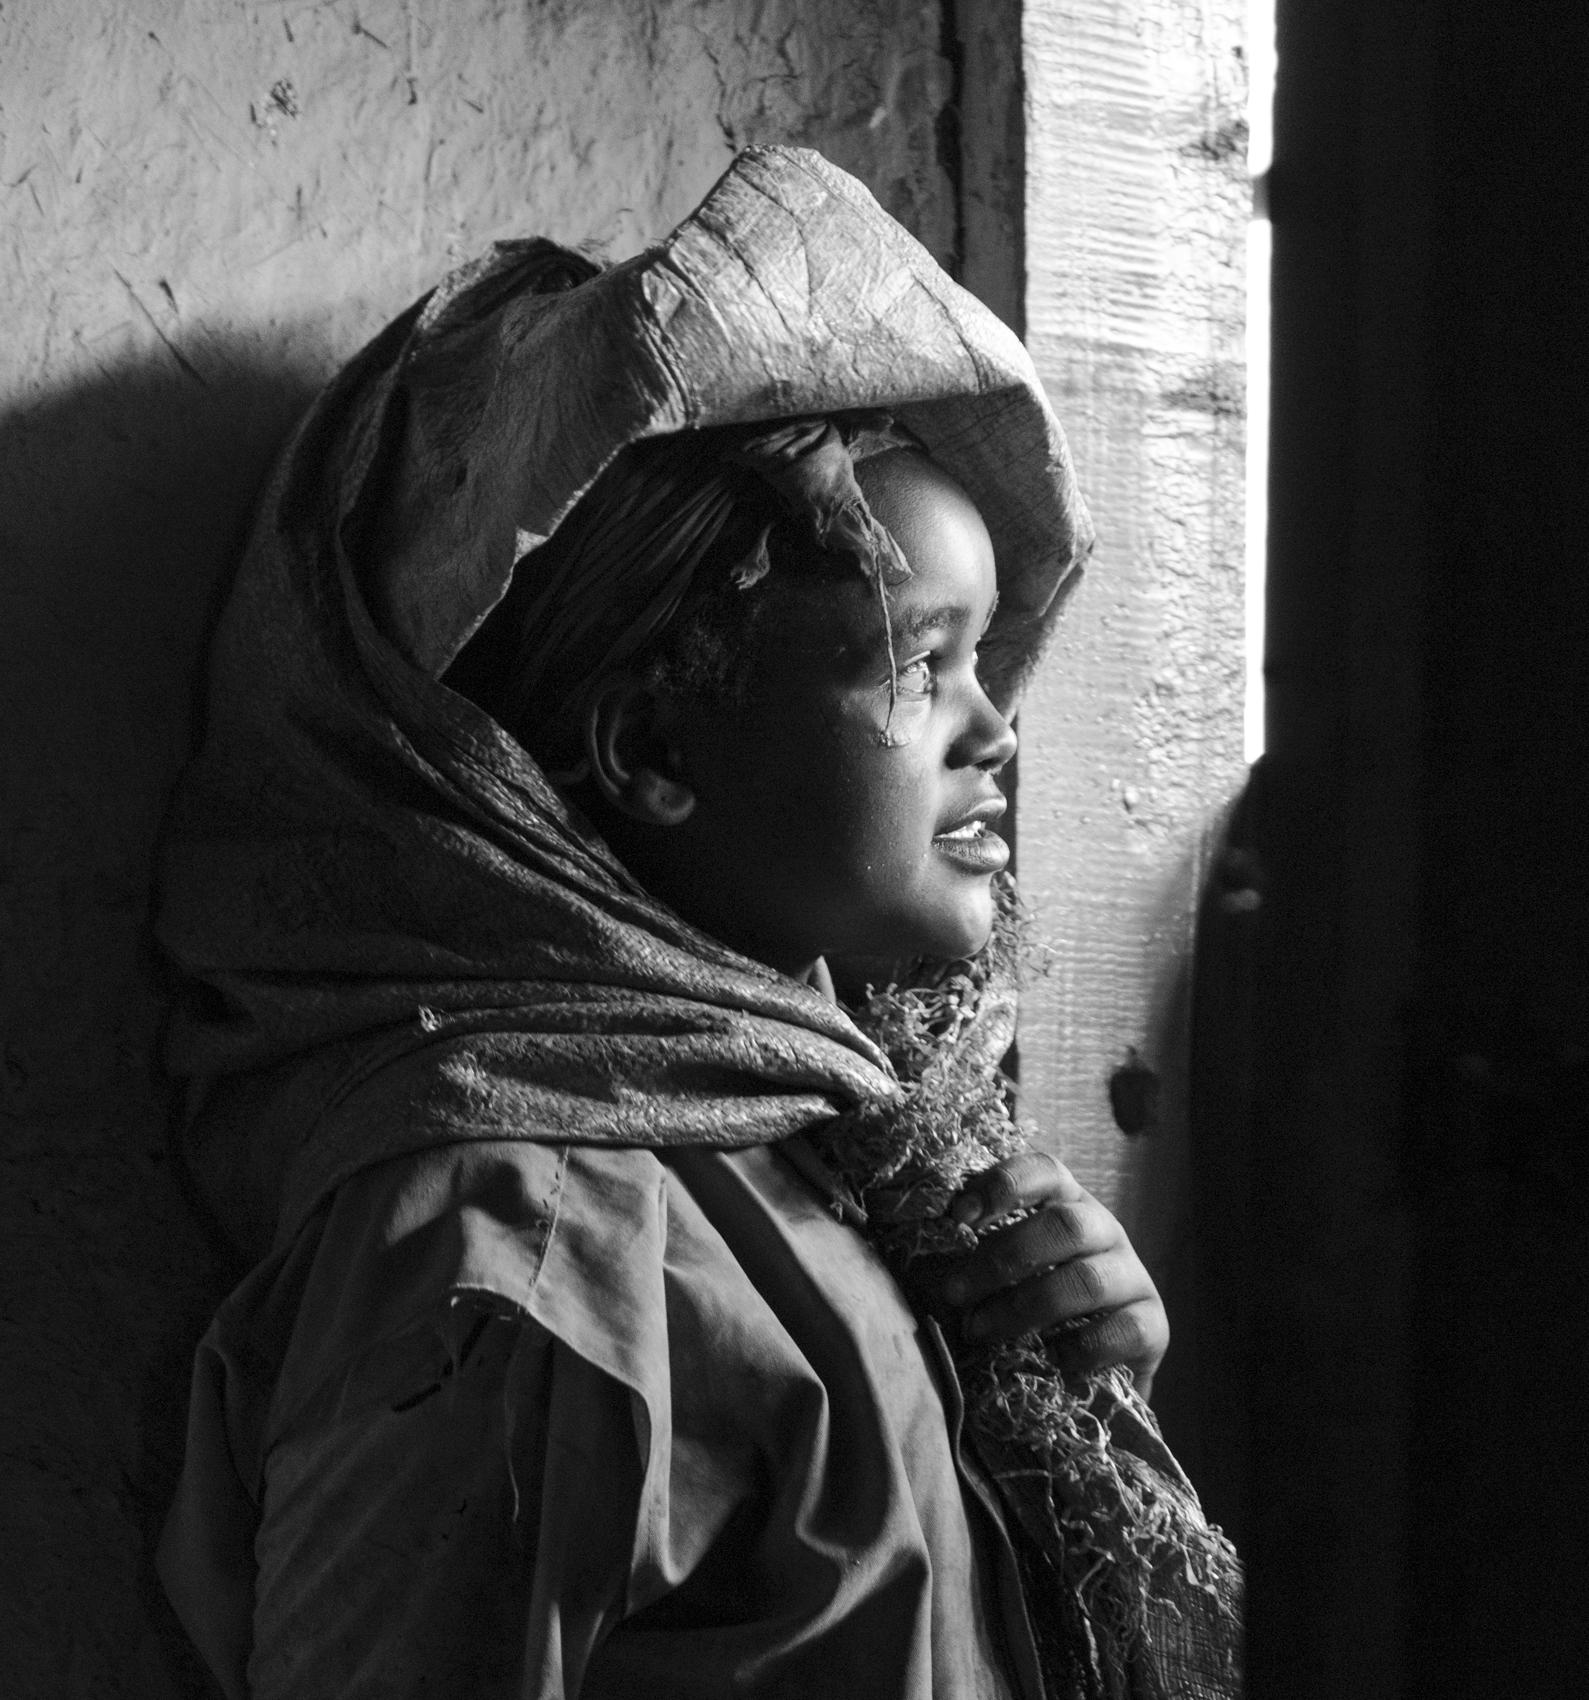 Dorze girl, waiting for rain to stop